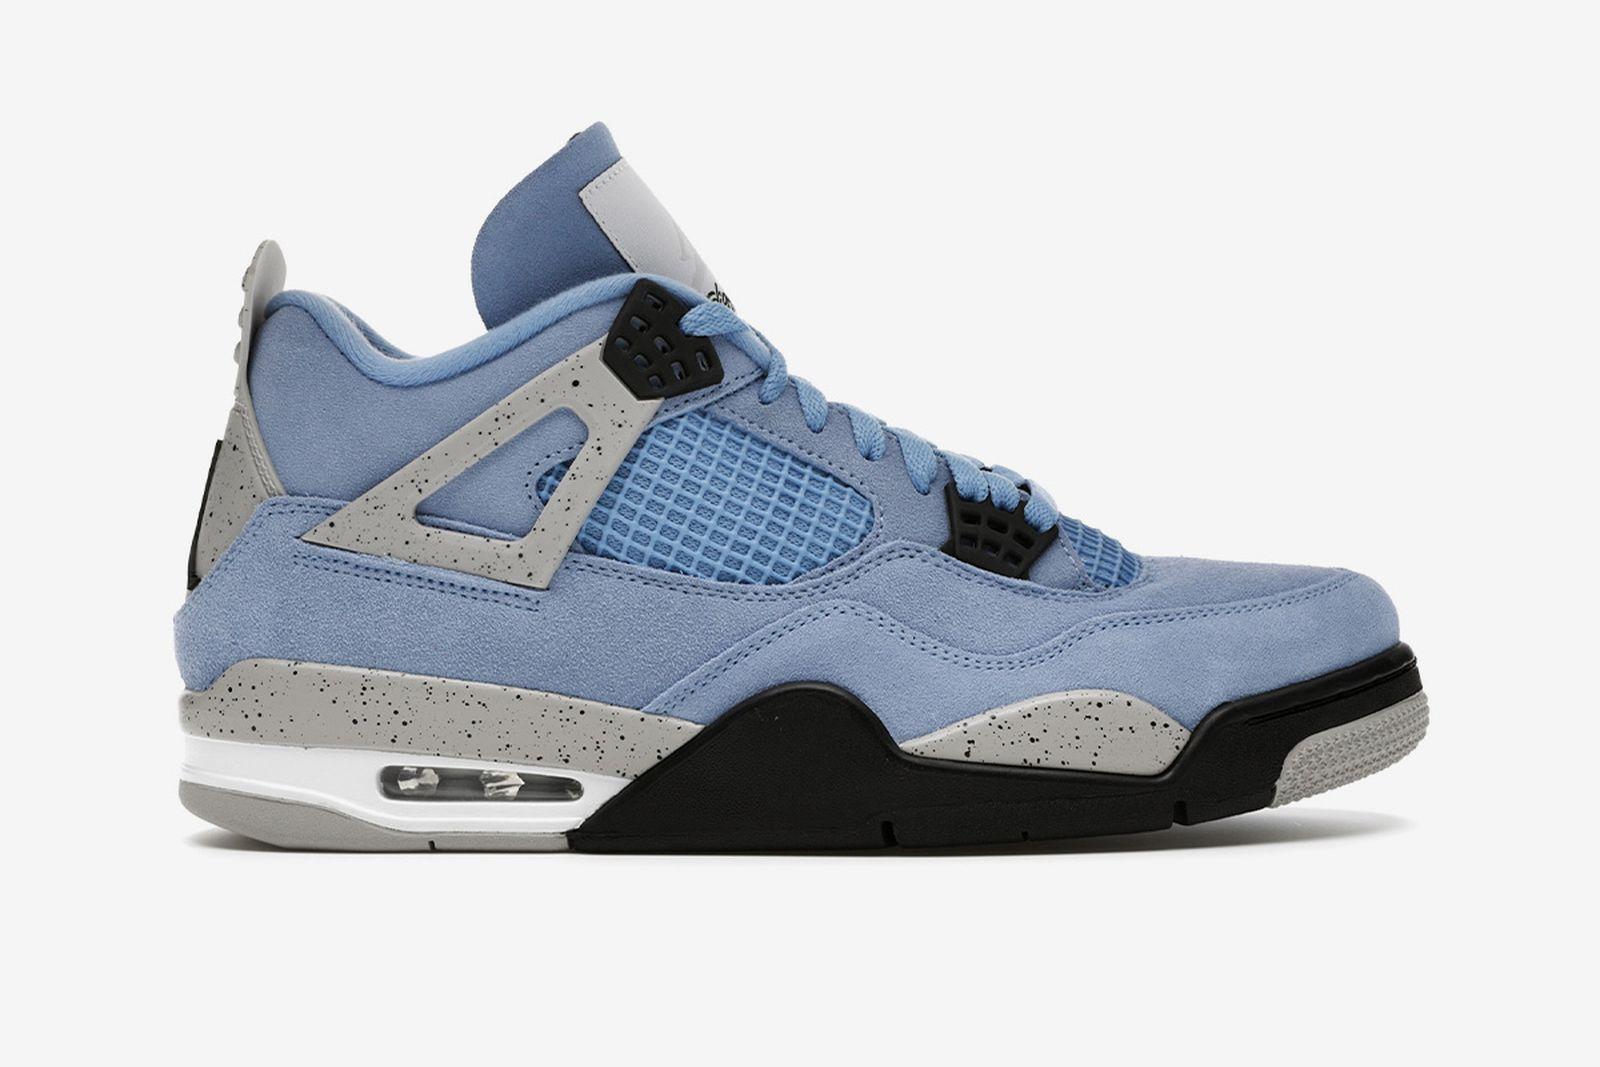 Nike Jordan 4 University Blue: Resale Prices & Where to Buy